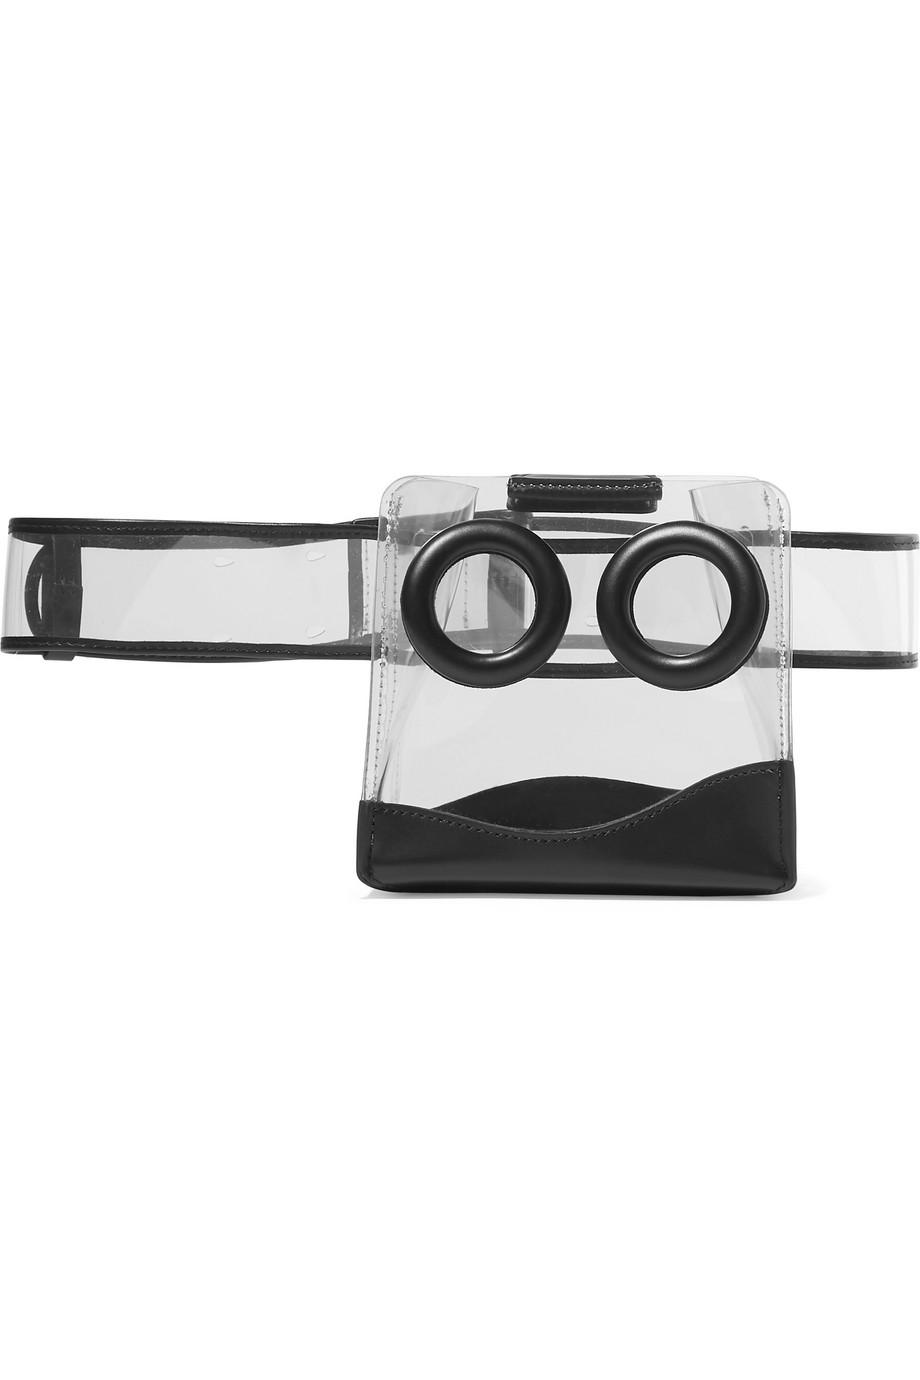 BOYY Deon PVC and leather belt bag